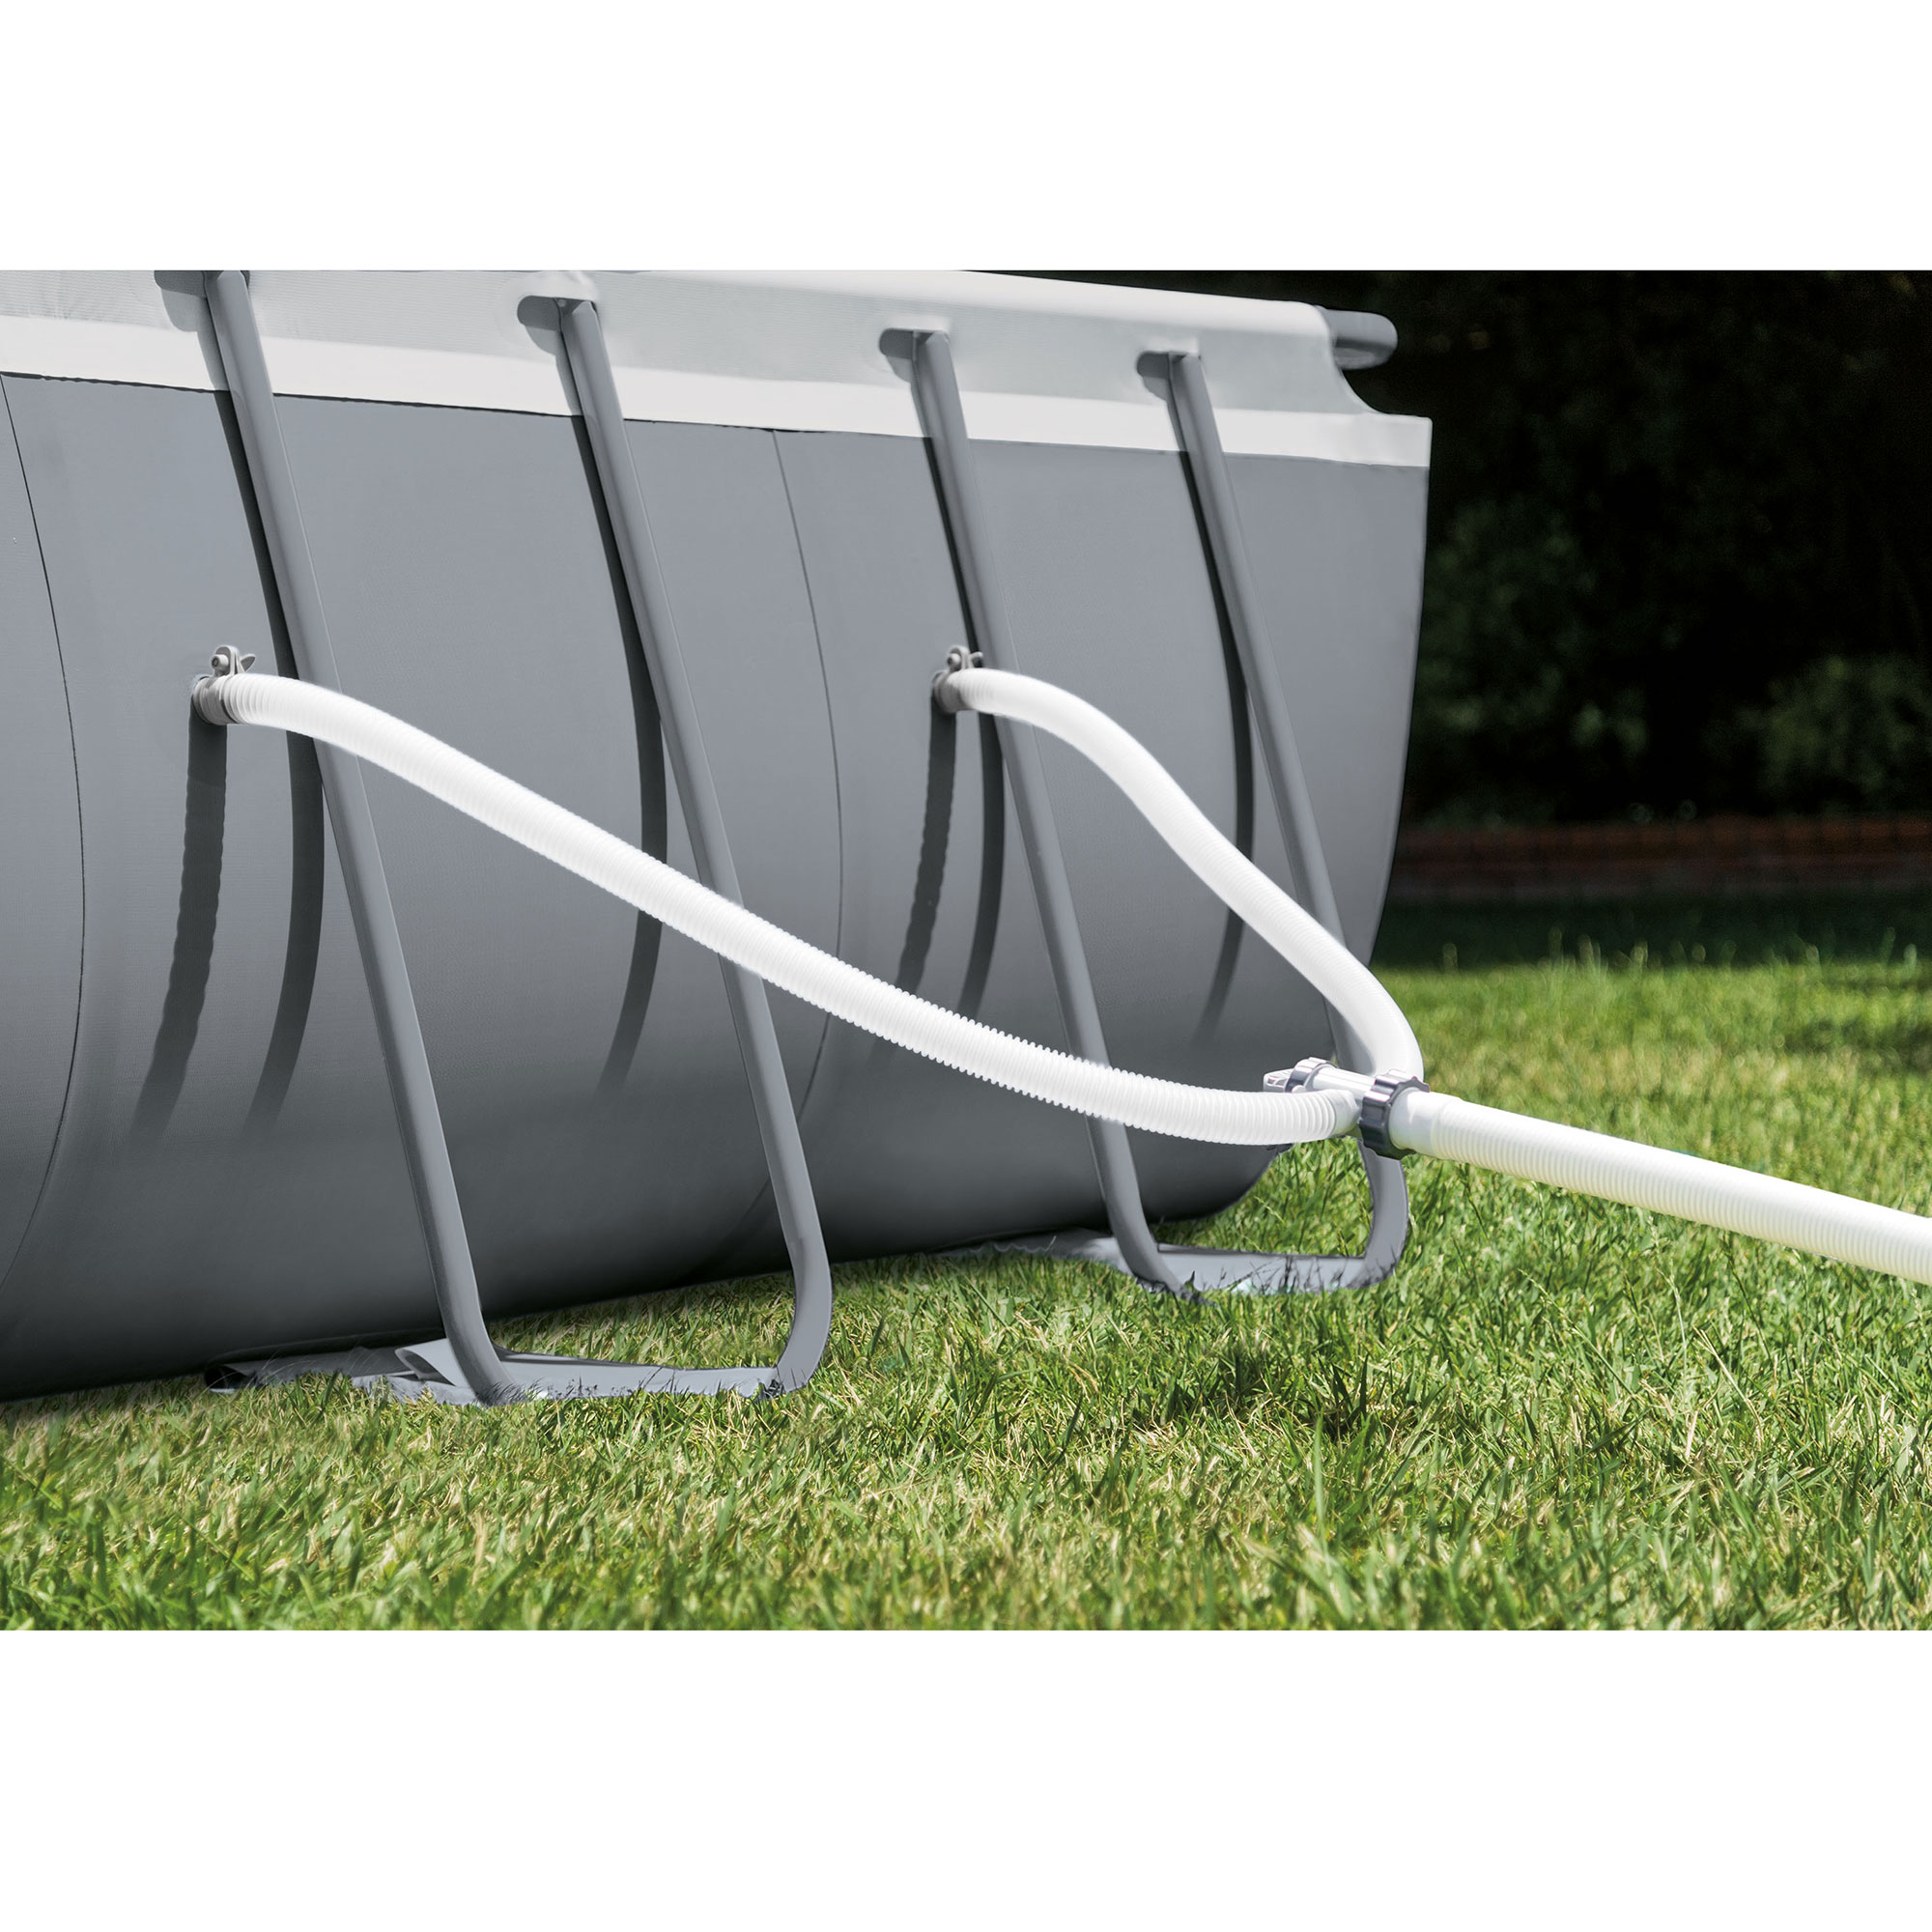 Intex 32 ft x 16 ft x 52 inch ultra xtr rectangular - Ultra frame rectangular swimming pool ...